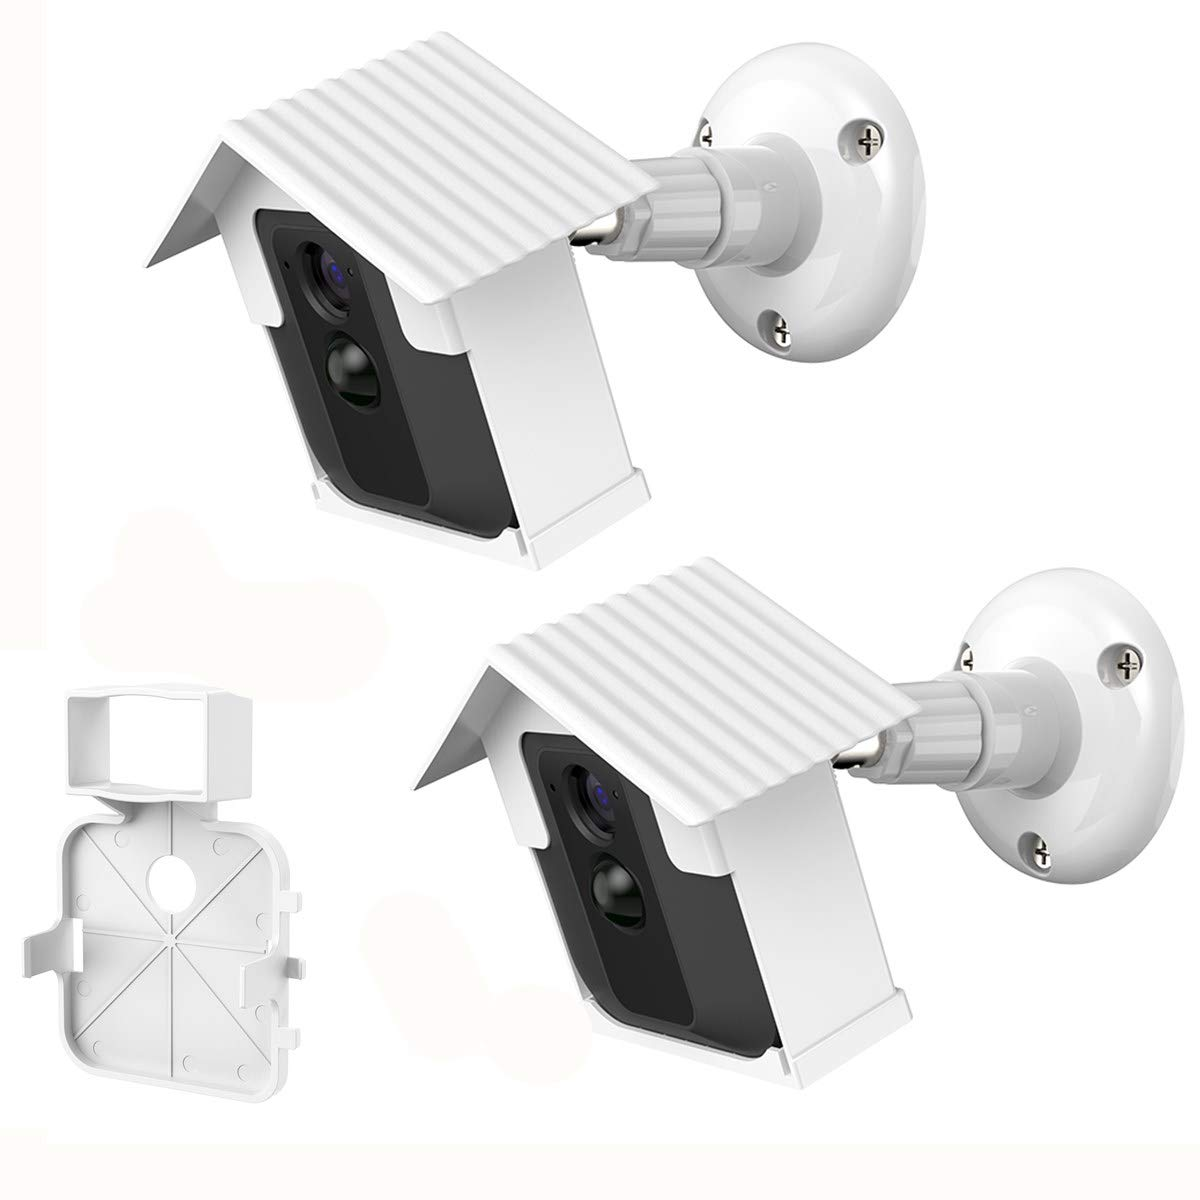 BECROWMUS Blink XT ウォールマウントブラケット 耐候性 360度保護 屋内外用 マウントカバーケース Blink XTスマートスポットカメラ用 アンチグレアUV保護 Case-HNUS-HS0179-W B07HCJ34X8 White(2 case+1 stand)